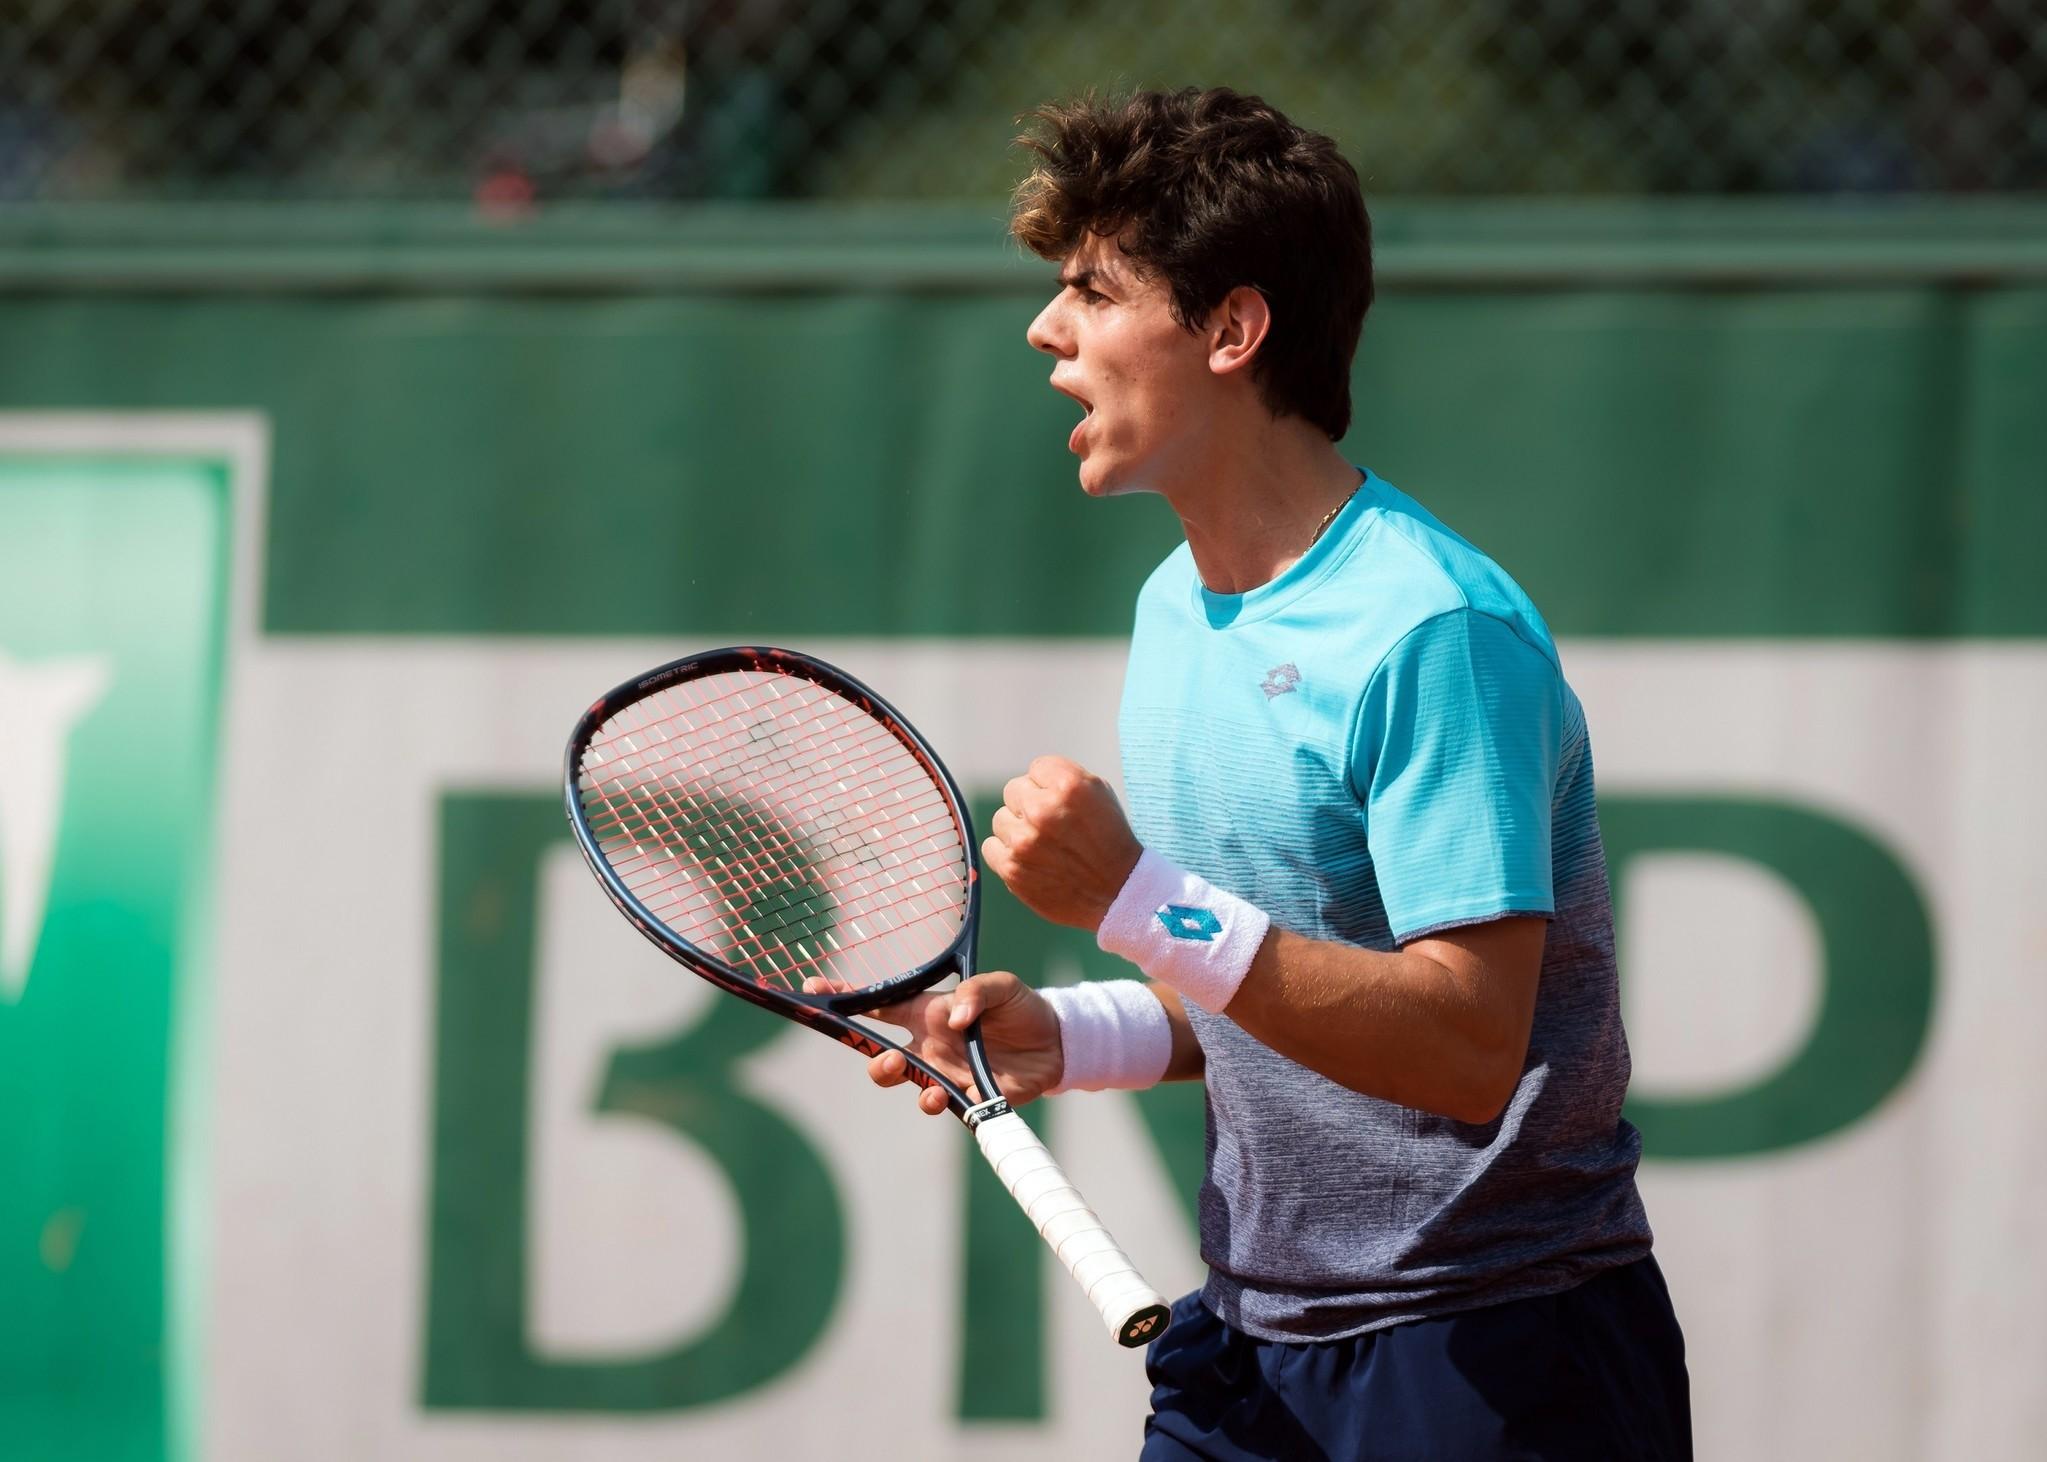 Turkeyu2019s Yanku0131 Erel celebrates after winning the boysu2019 doubles Wimbledon title Sunday.